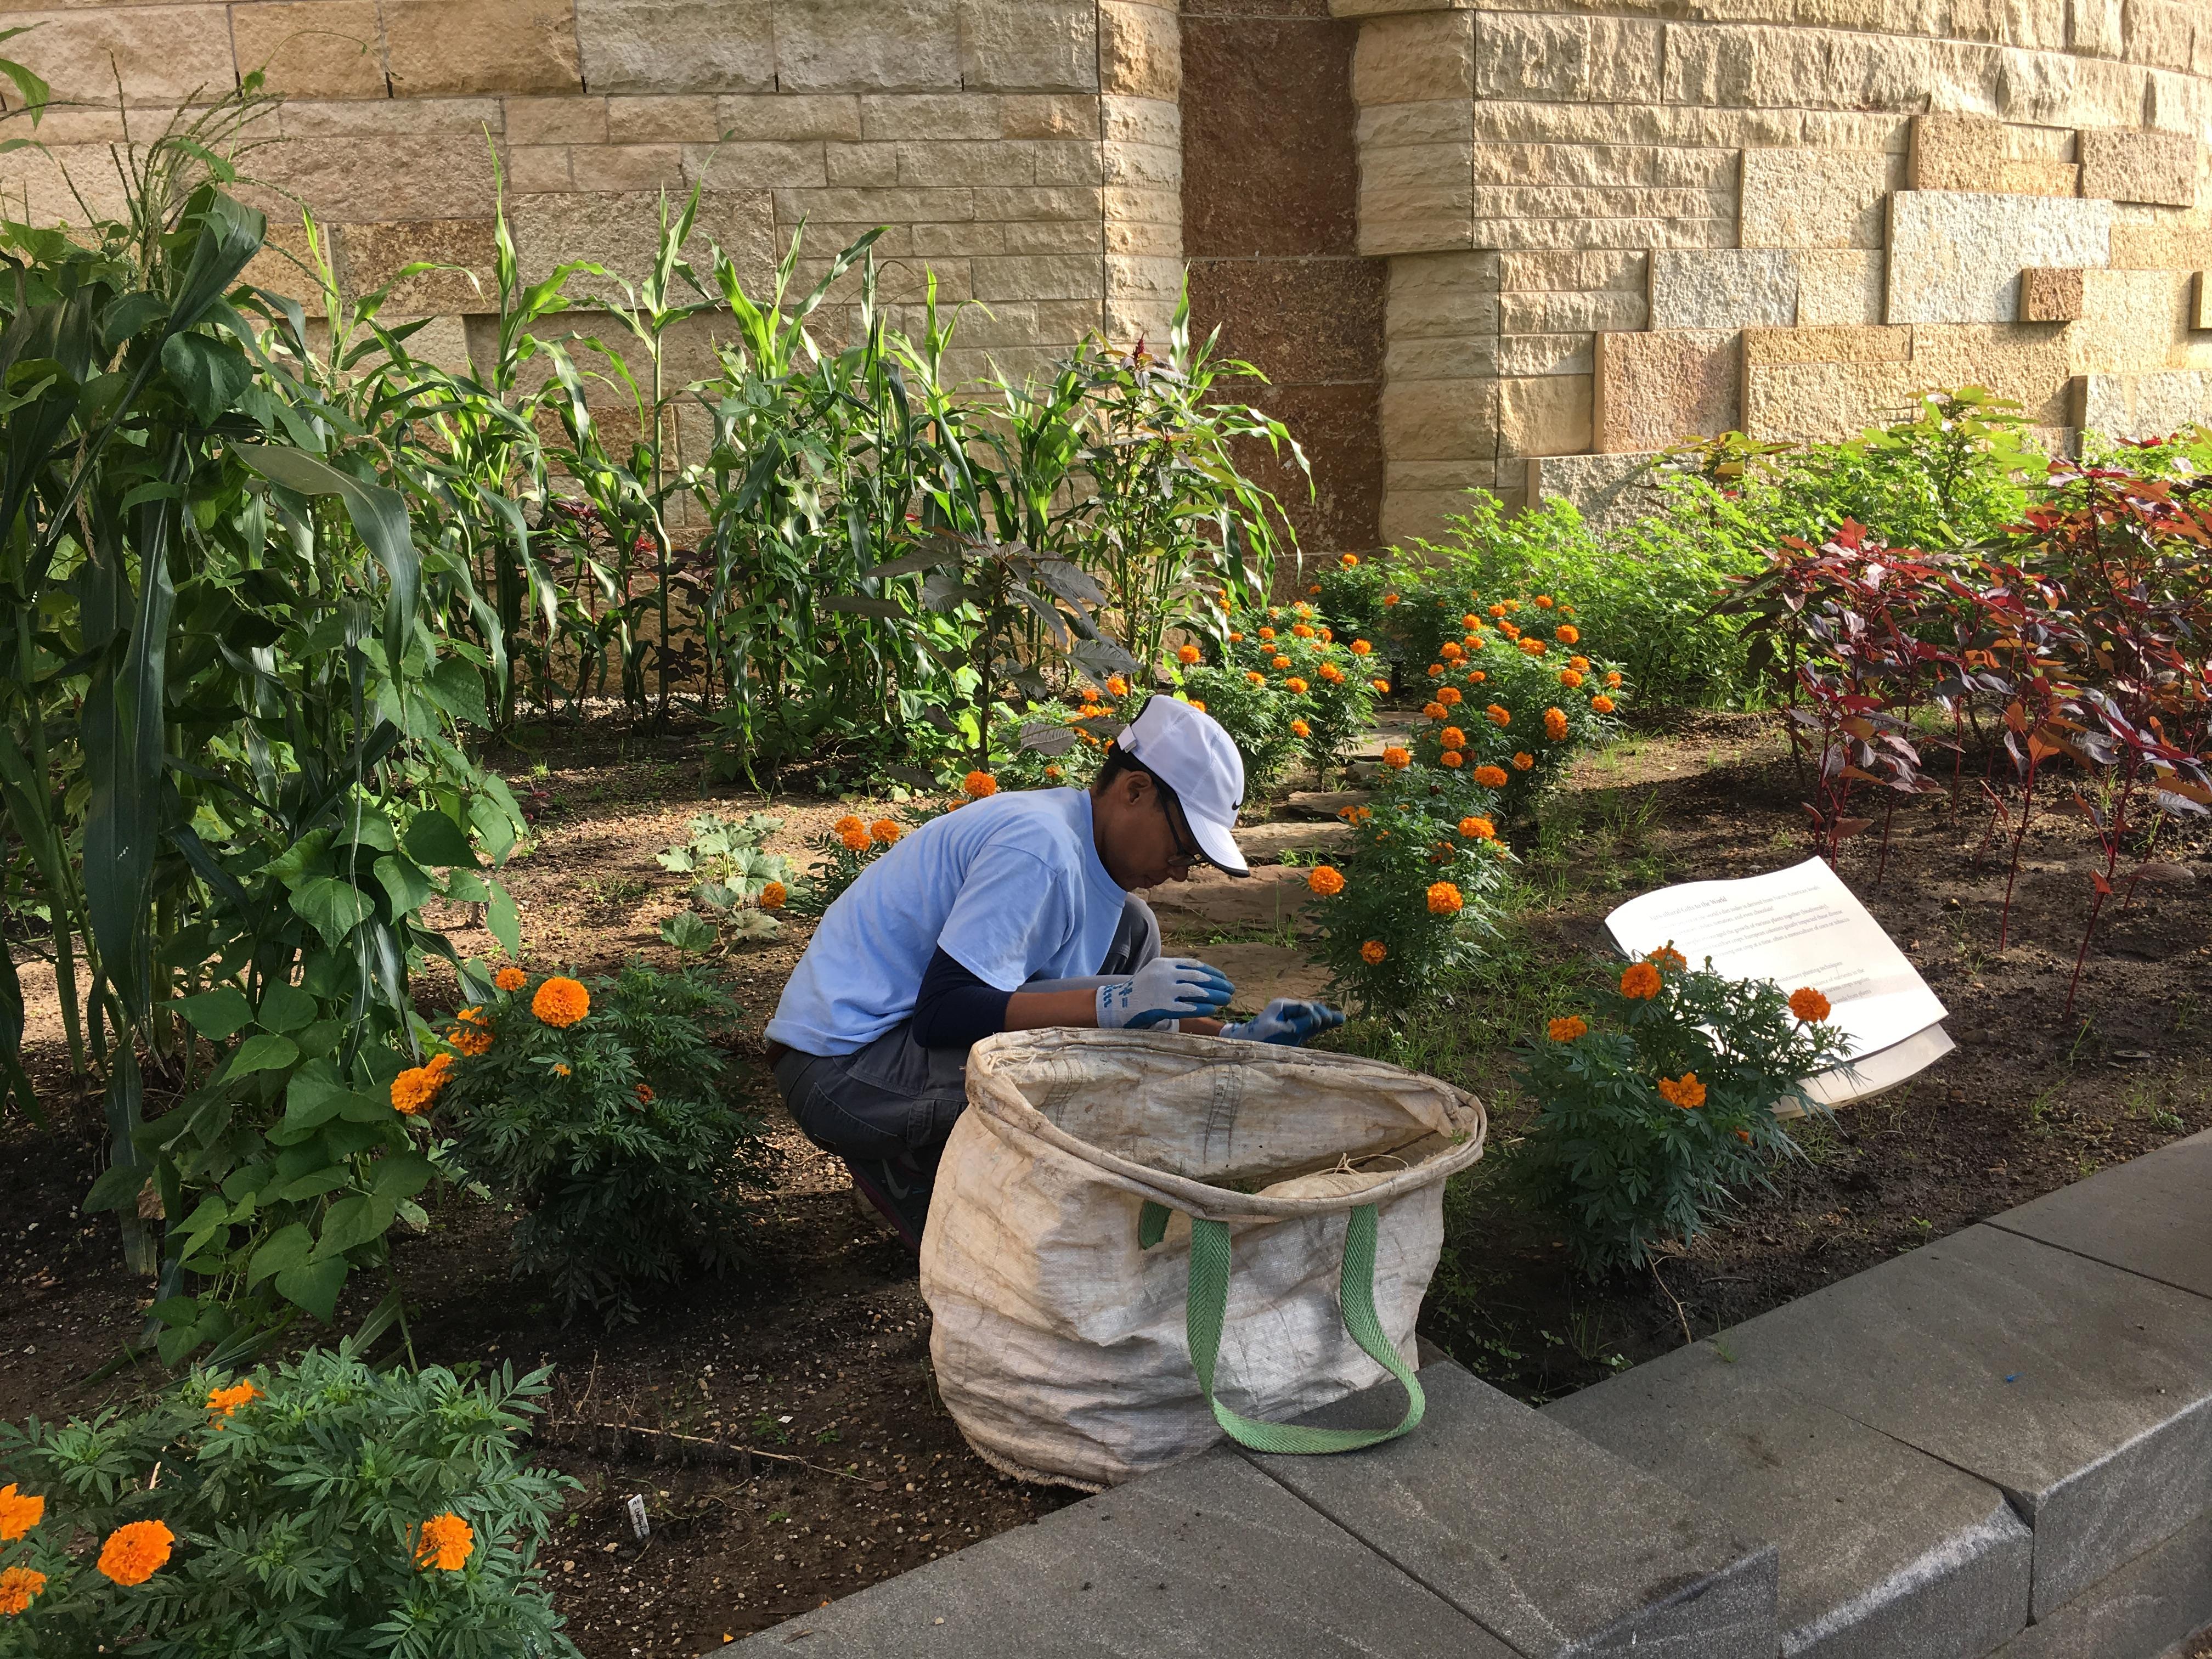 Volunteer pulls weeds near corn and marigold plantings